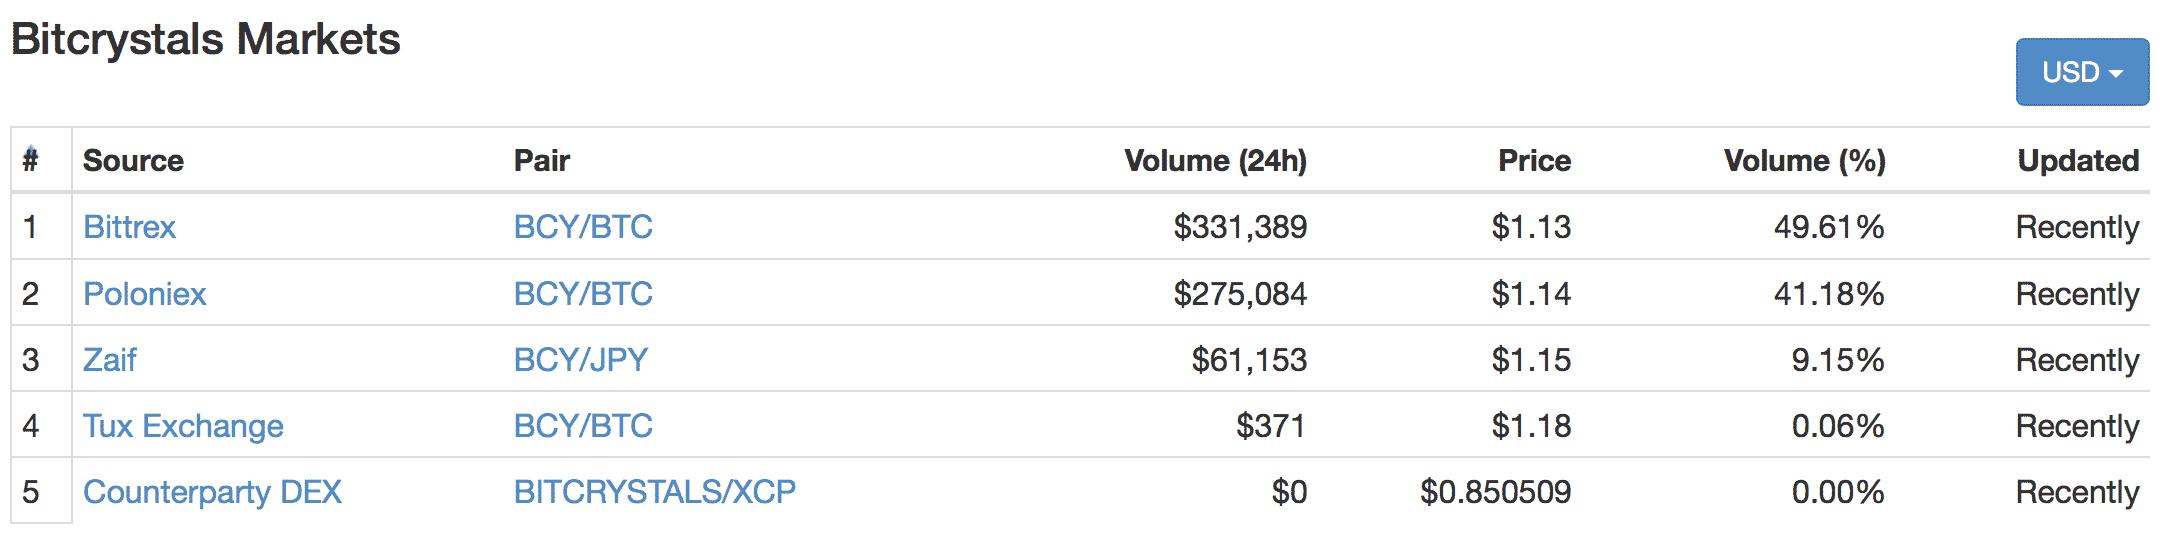 BitCrystals(ビットクリスタルズ)とは|仮想通貨の特徴・価格・チャート・取引所2